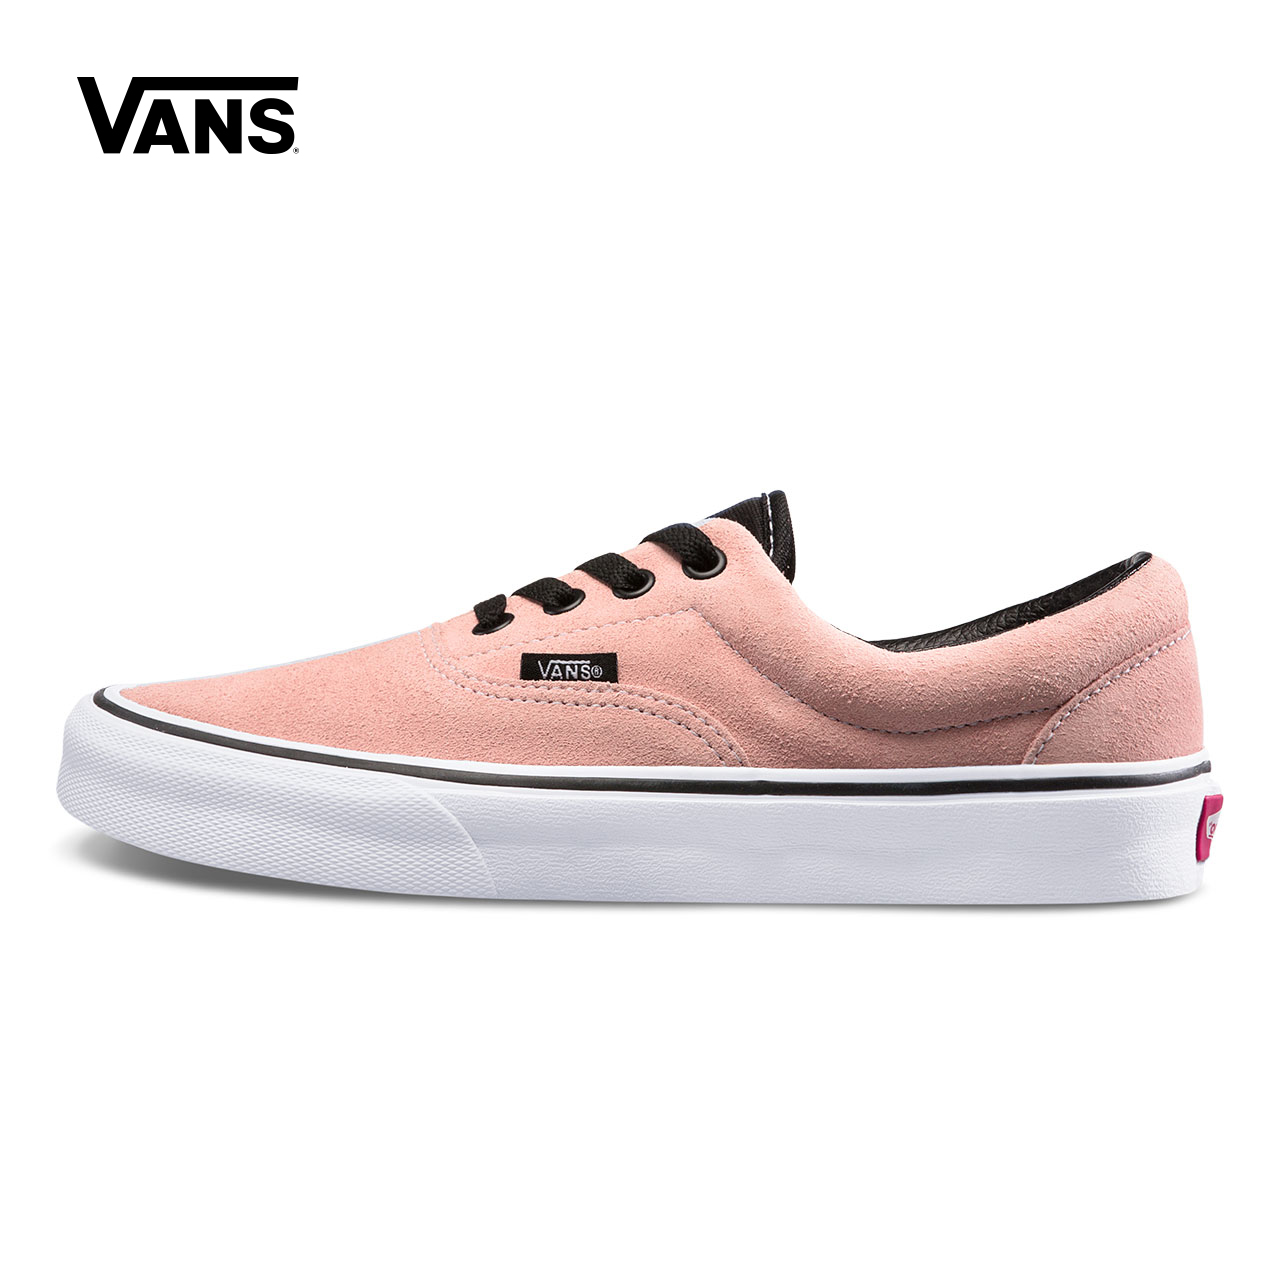 Vans范斯 经典系列 Era板鞋运动鞋 低帮女子果绿官方正品(用1元券)